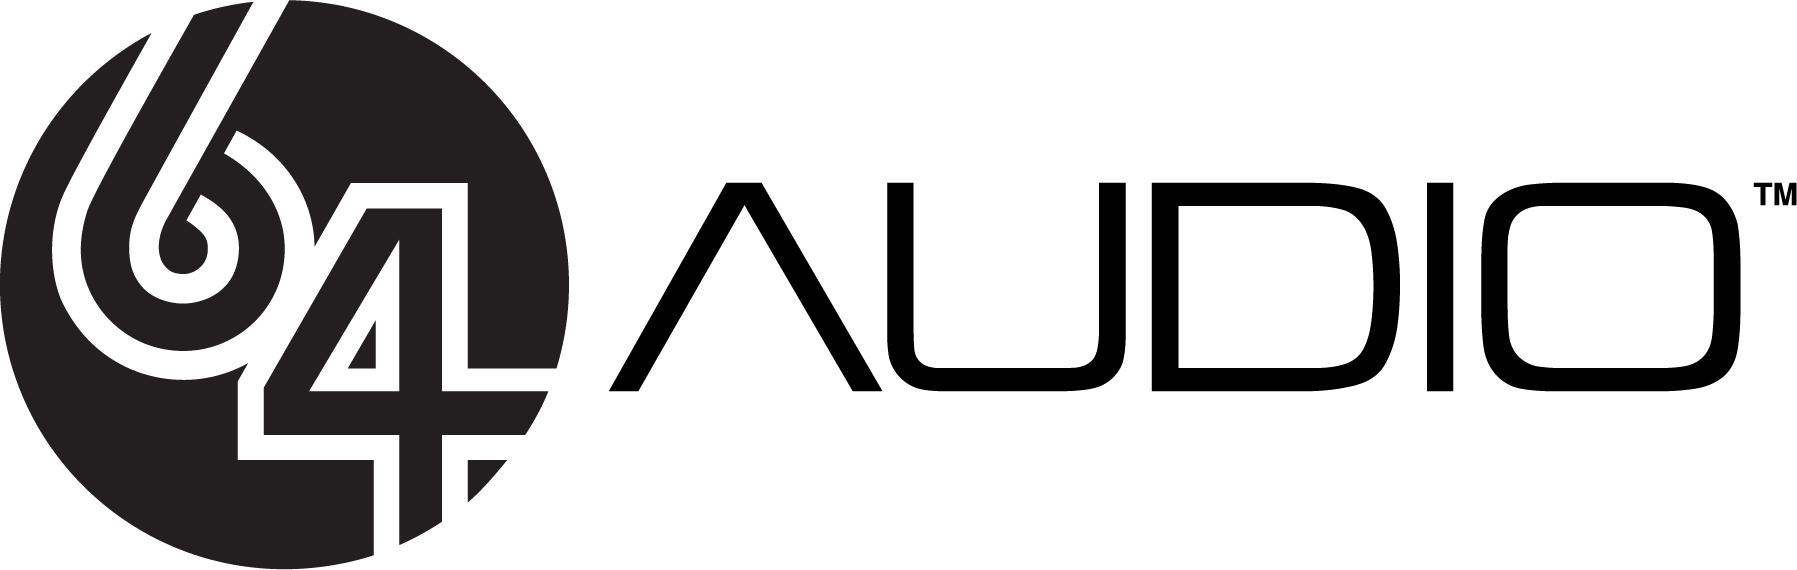 64Audio_horizontal_logo_bla